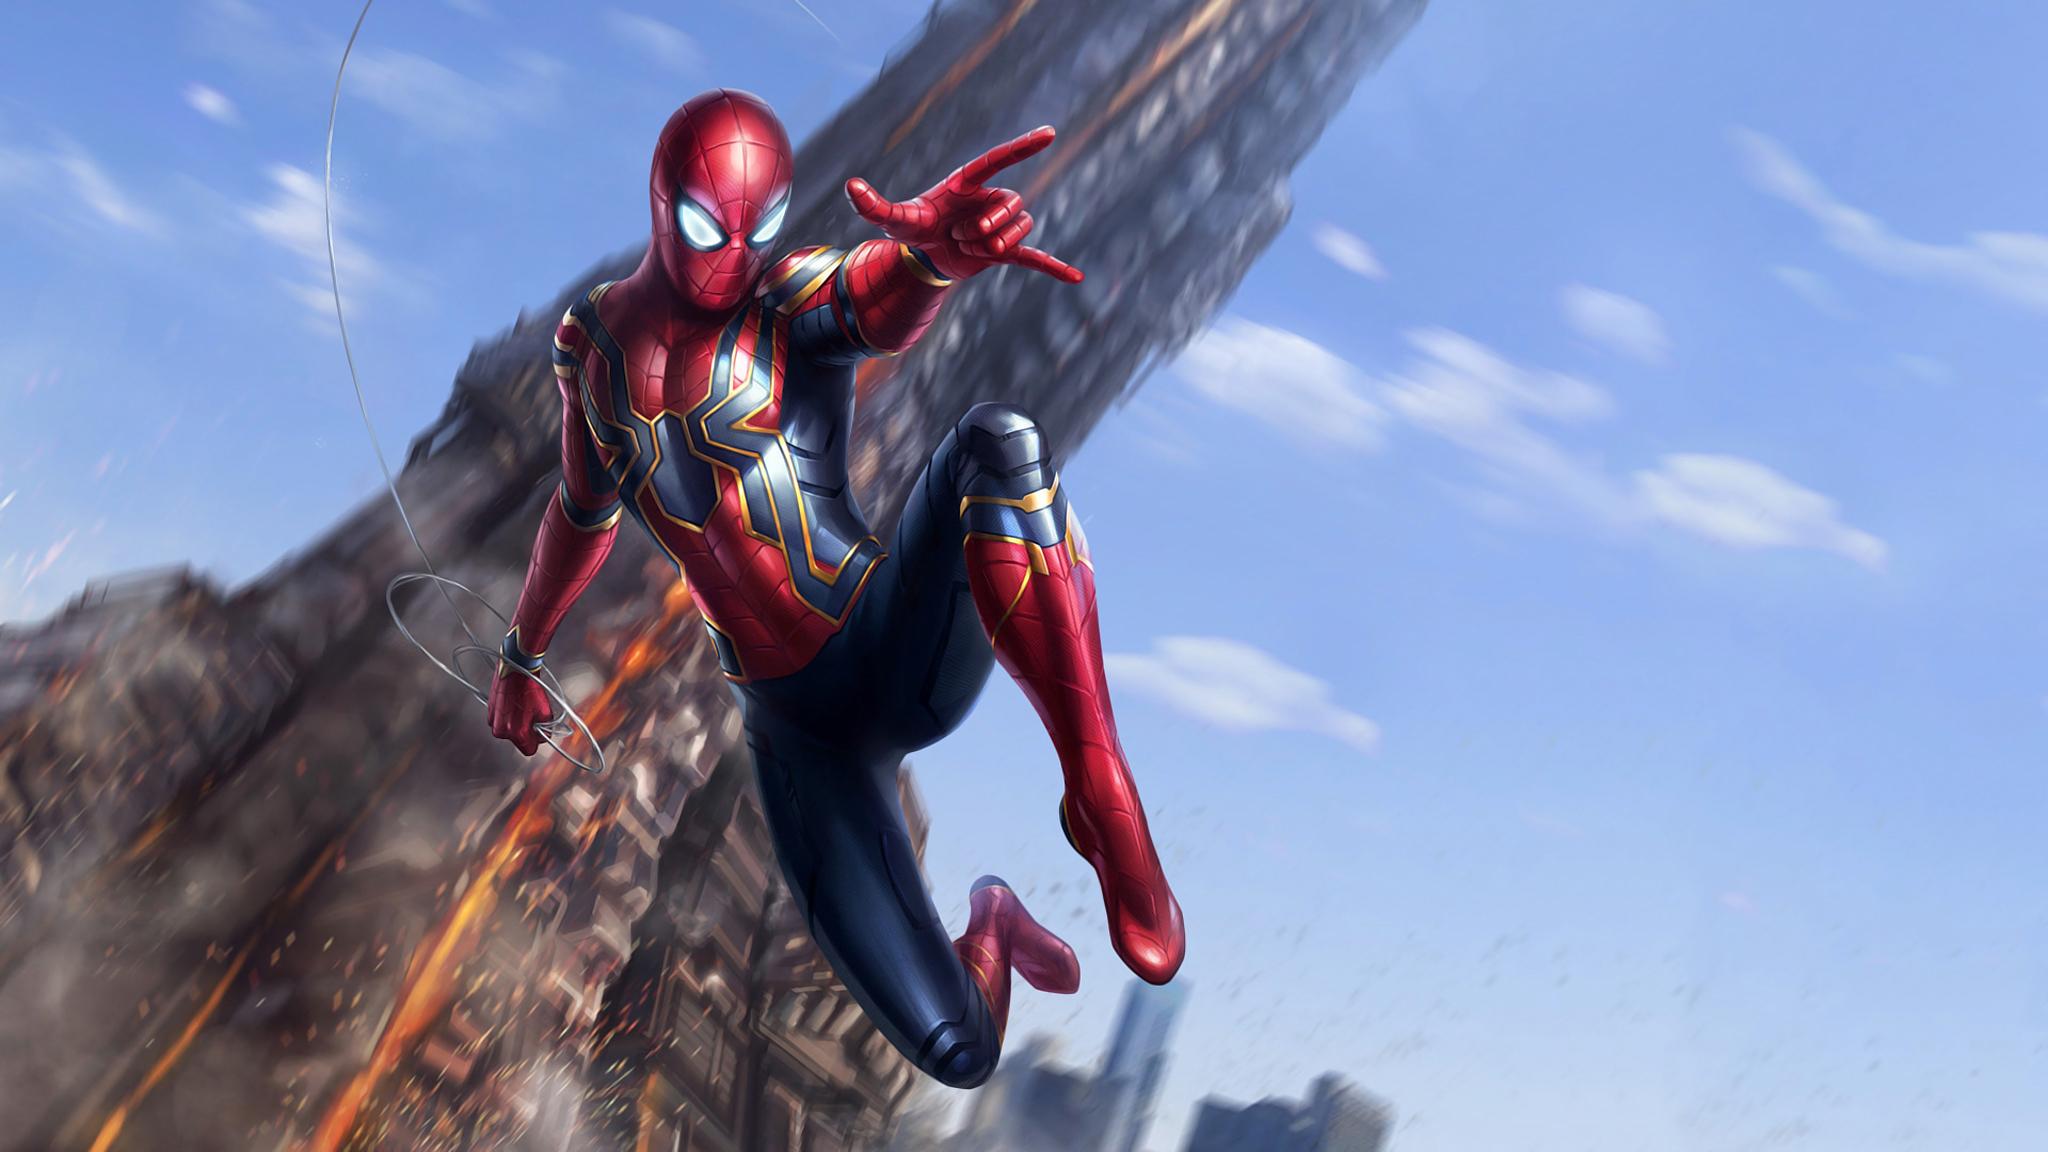 Iron-Spider Avengers Infinity War